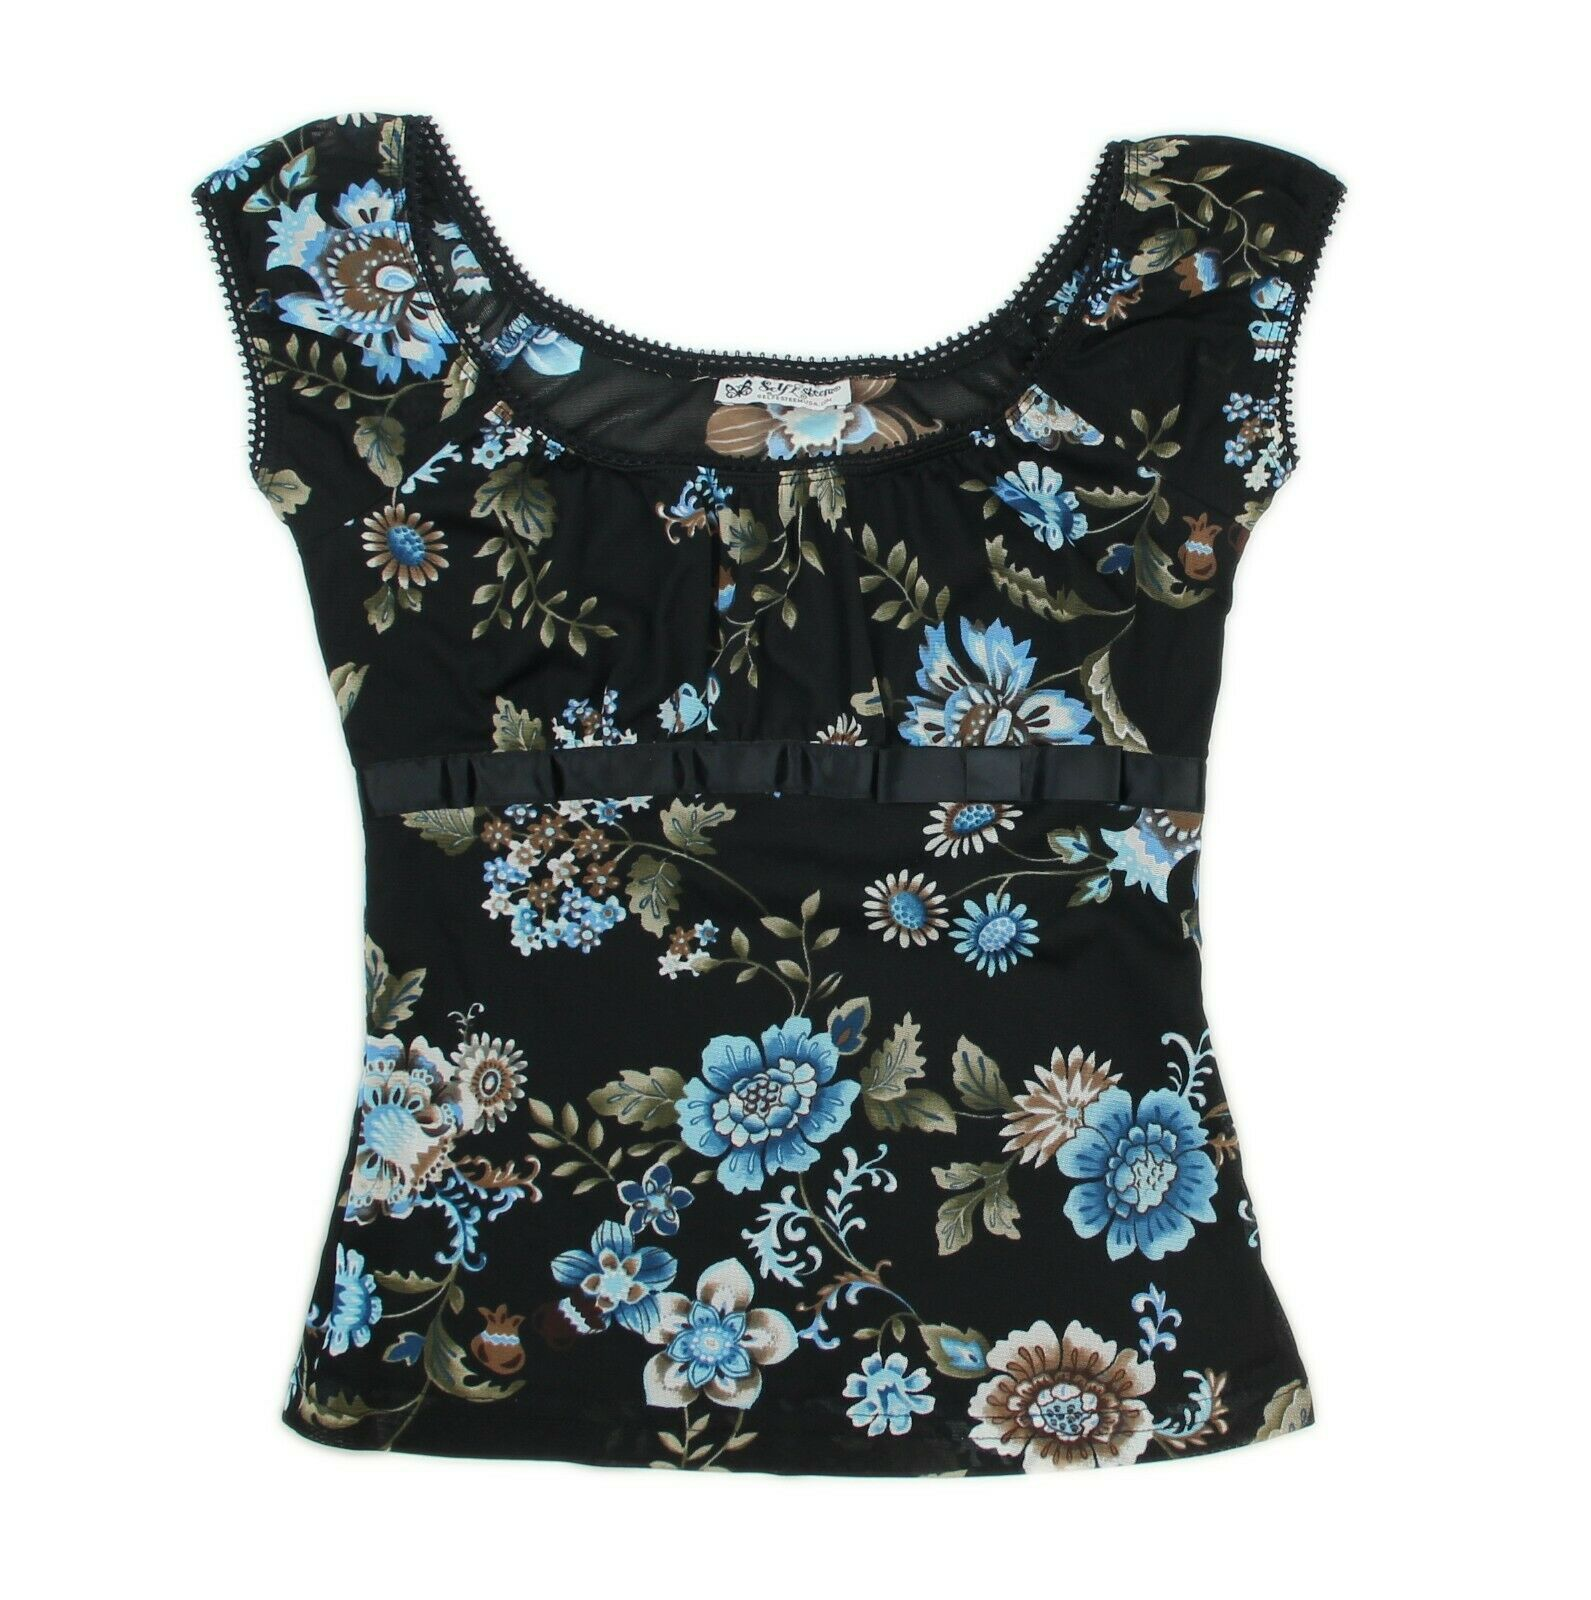 SELF ESTEEM Womens Size Small Black Blue Floral Top 9